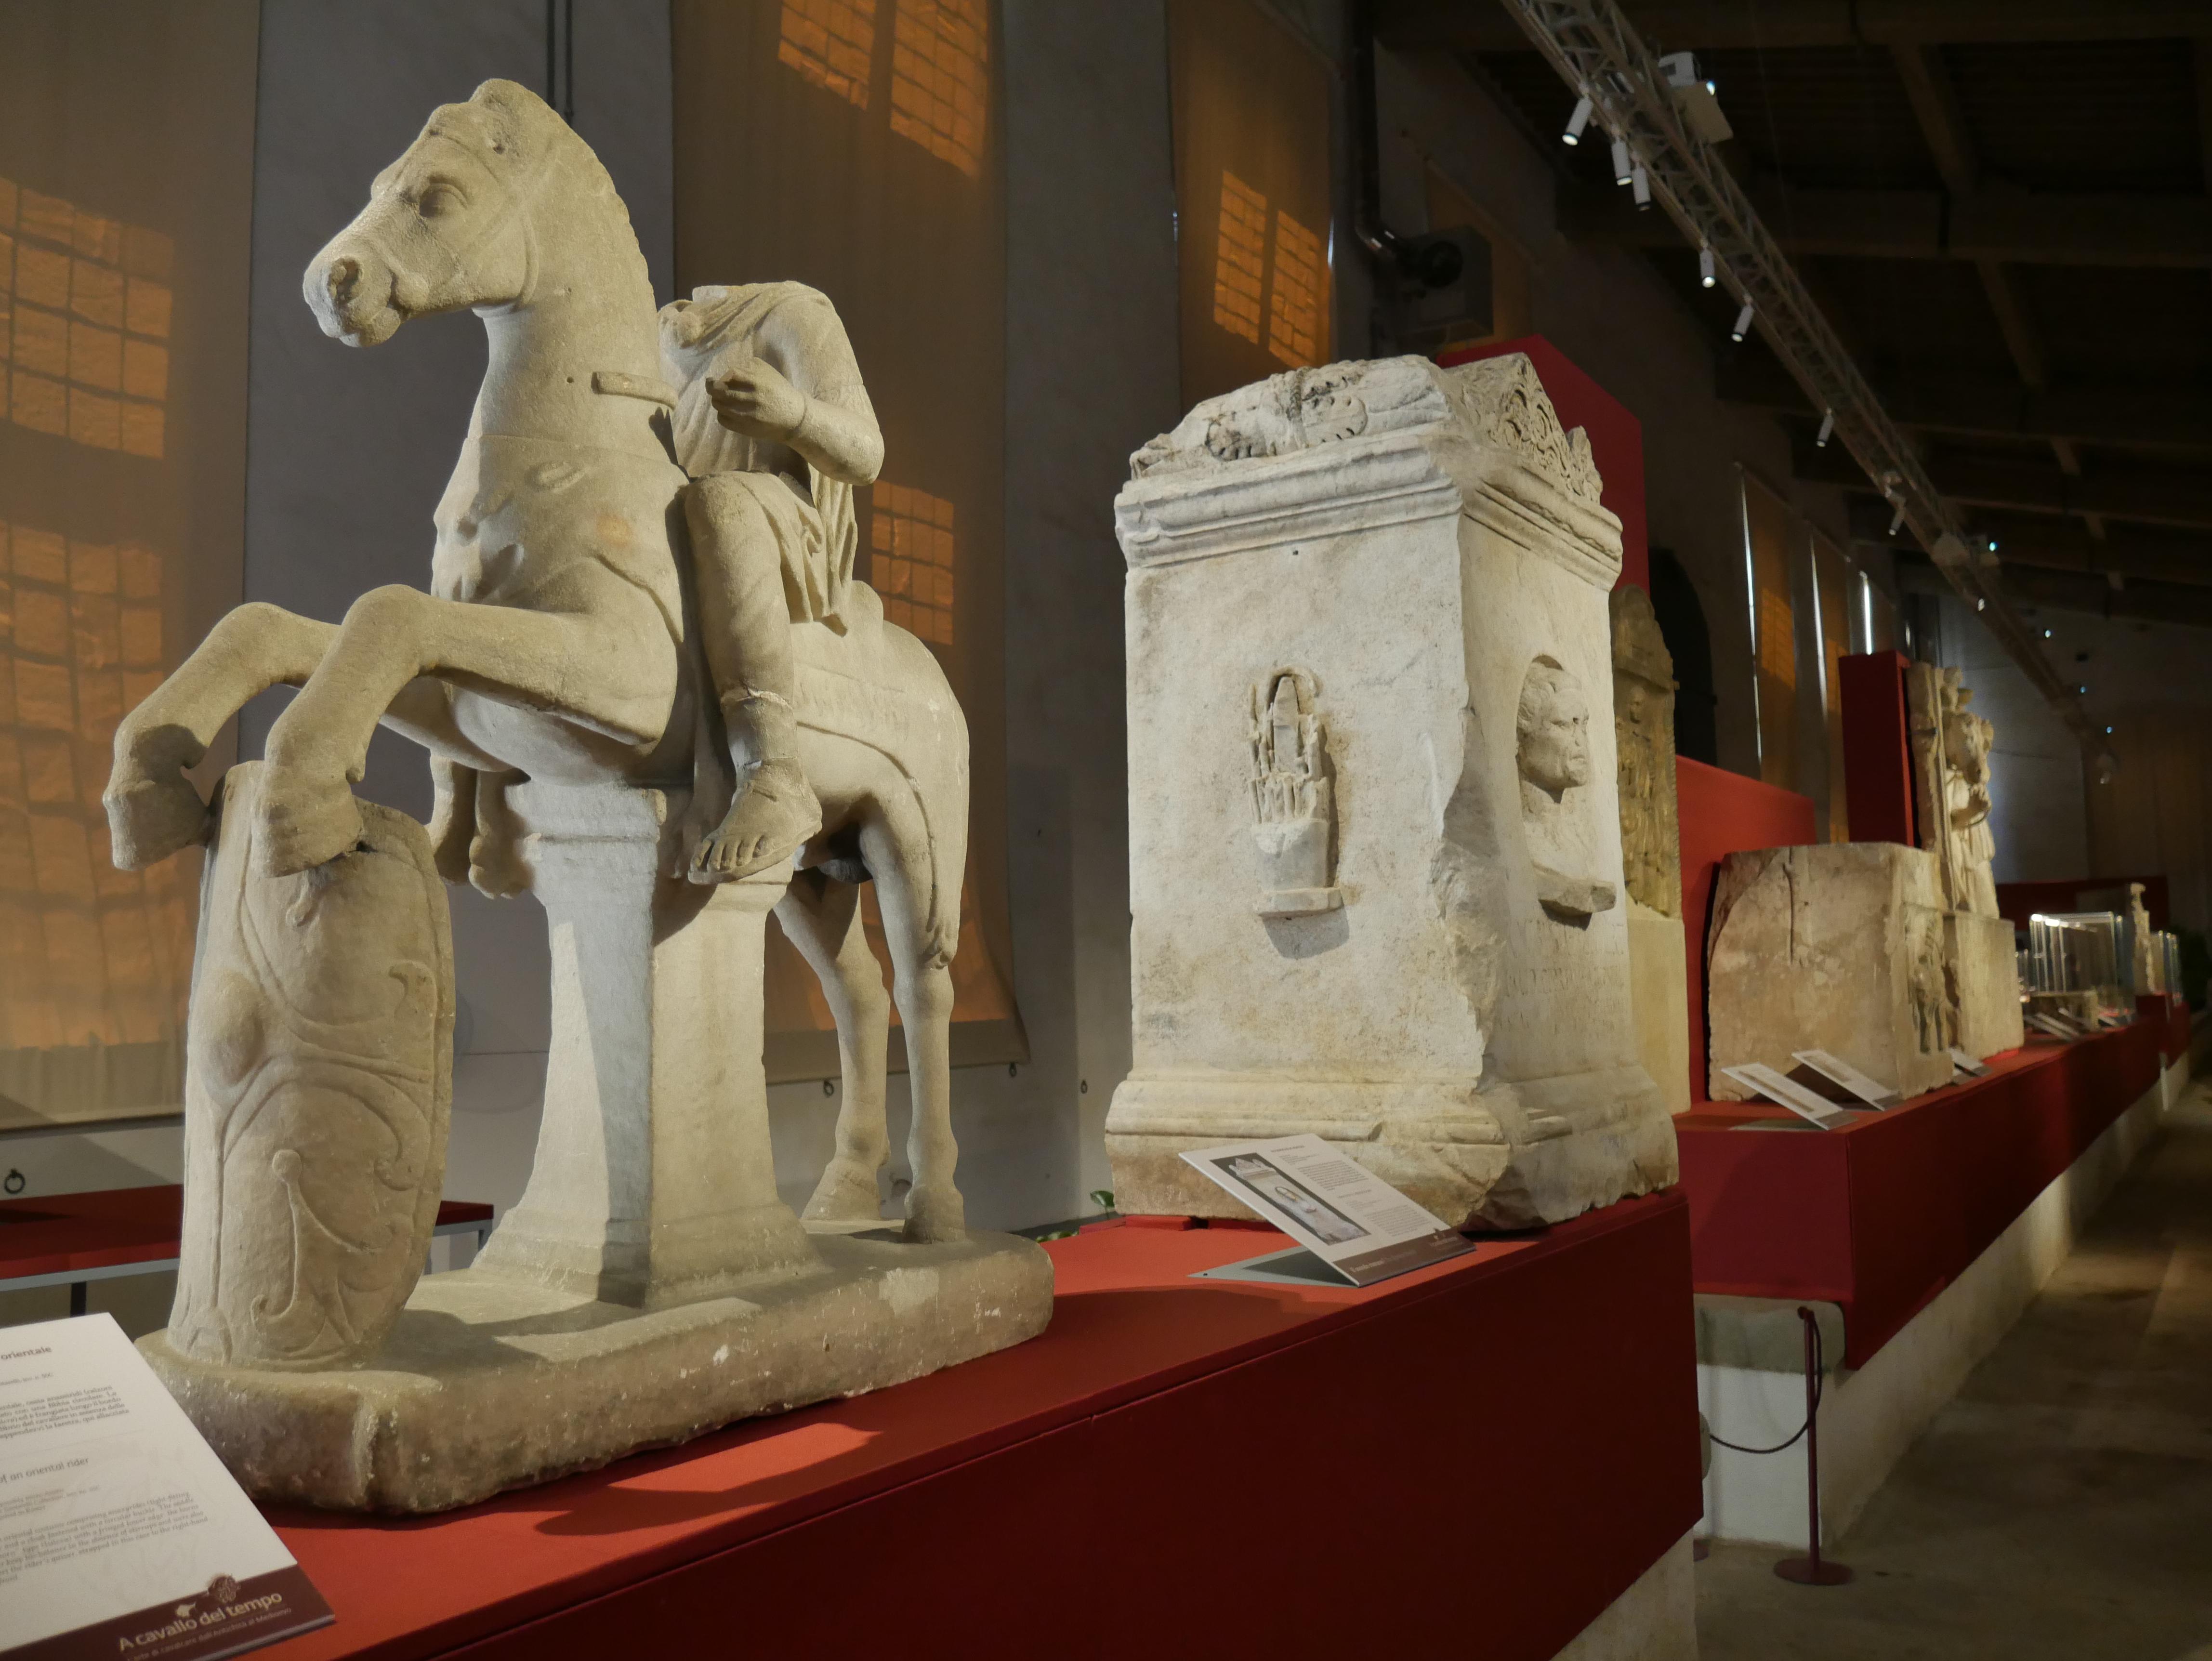 Ufficio Notai Medioevo : Medioevo u storie archeostorie